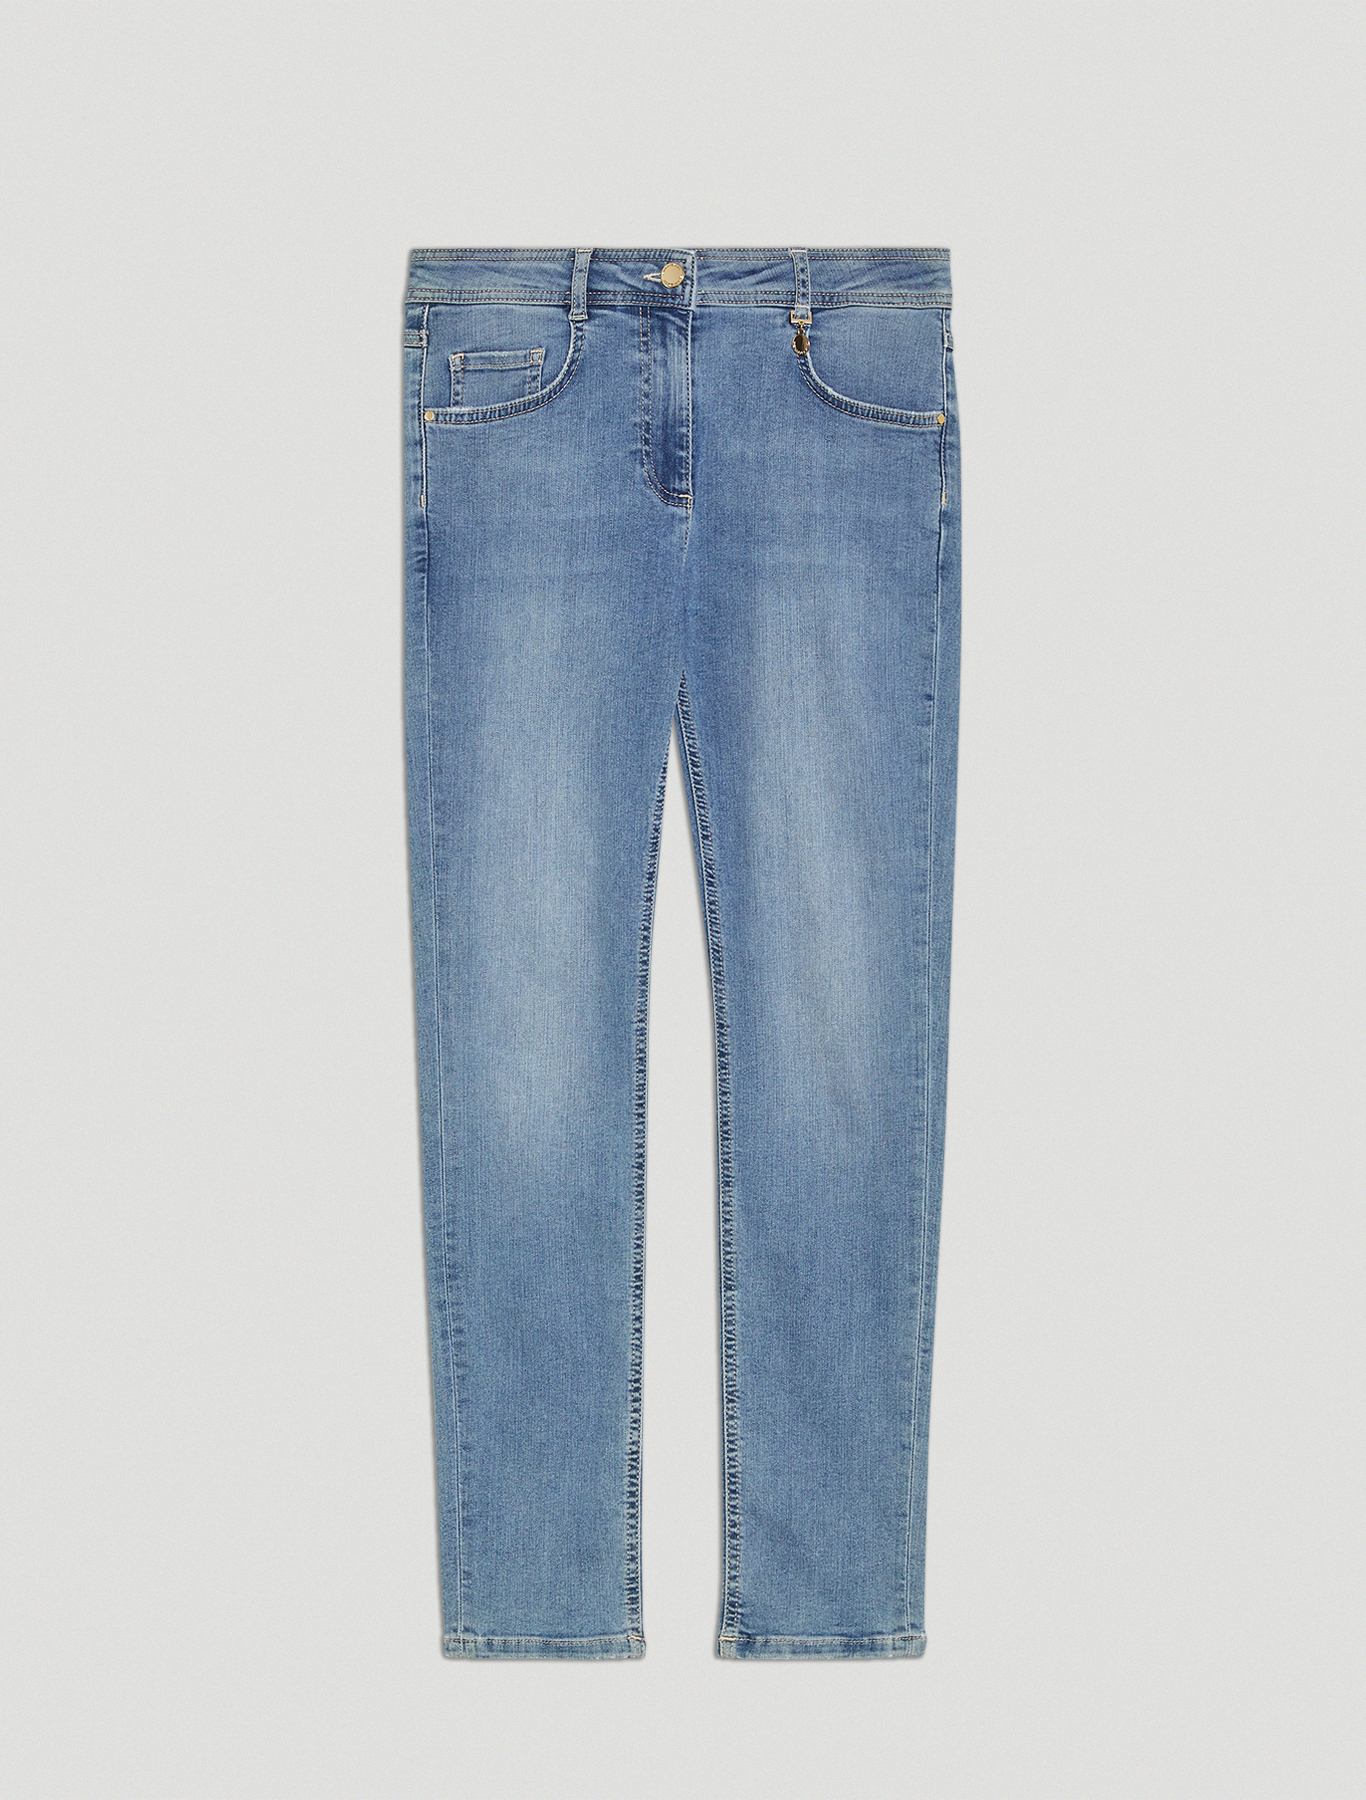 Super stretch skinny jeans - cornflower blue - pennyblack